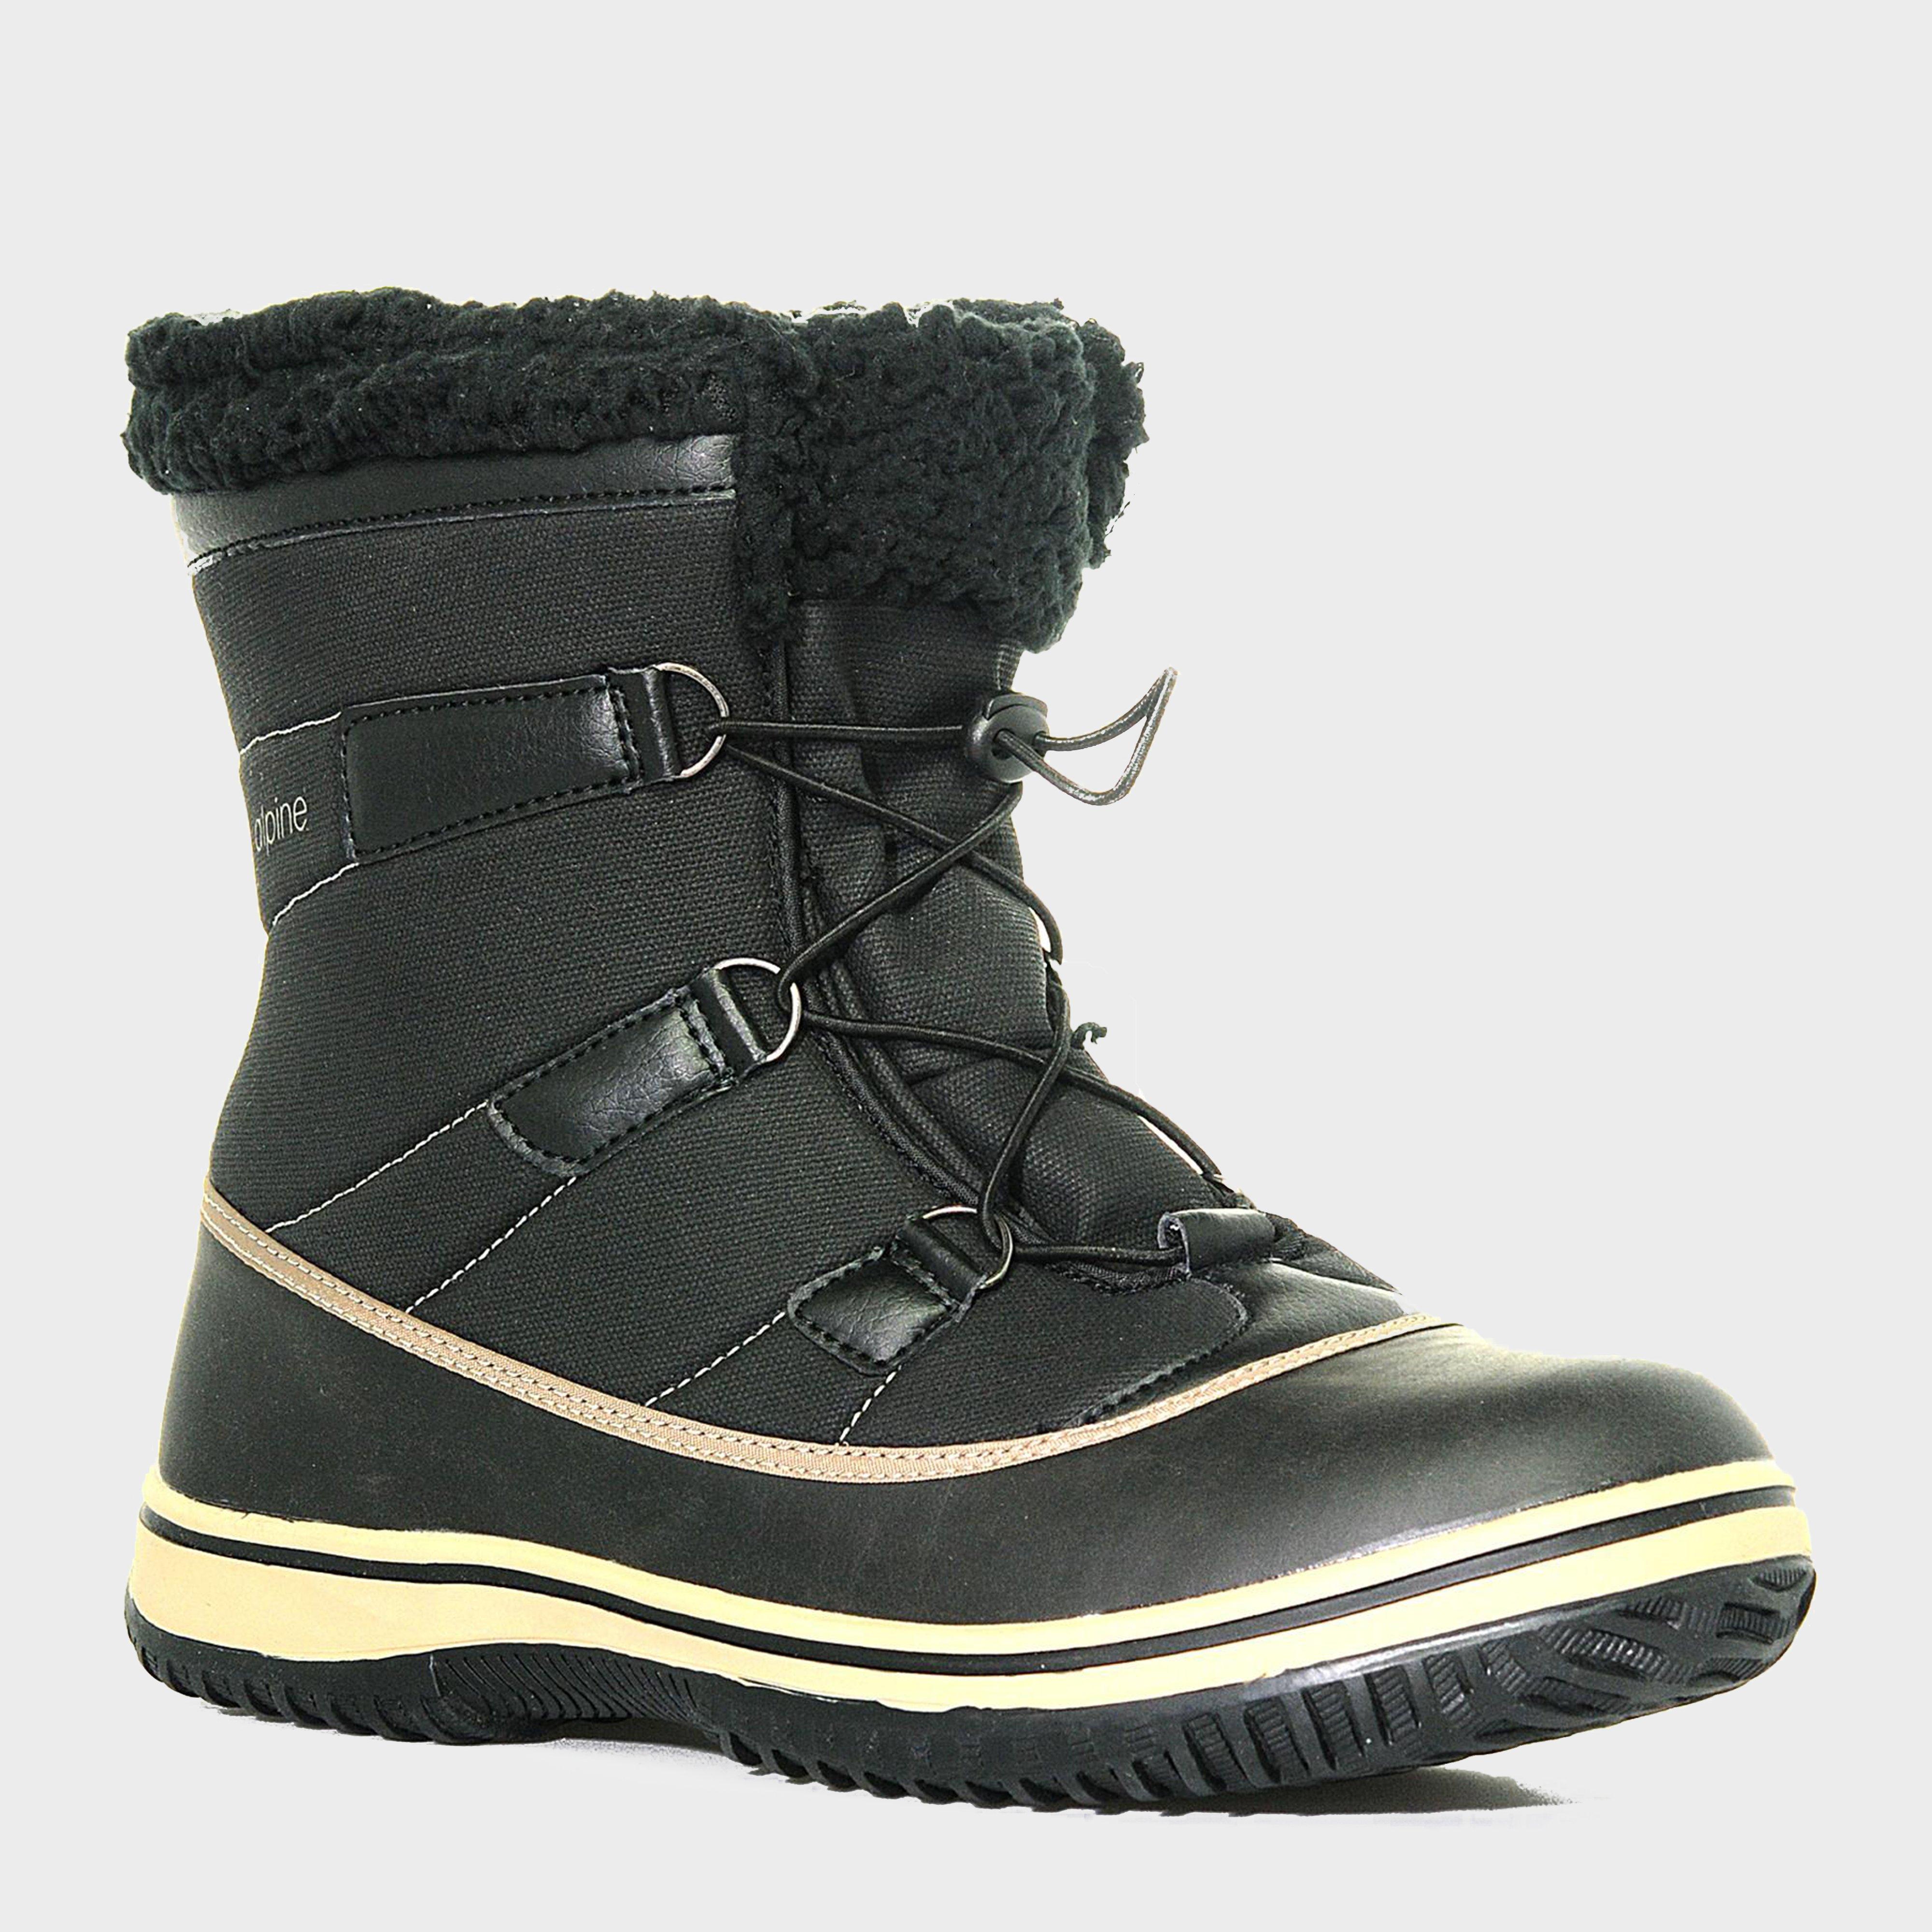 Alpine Men's Snow Boot, Black   Bear Grylls UK   £20.00